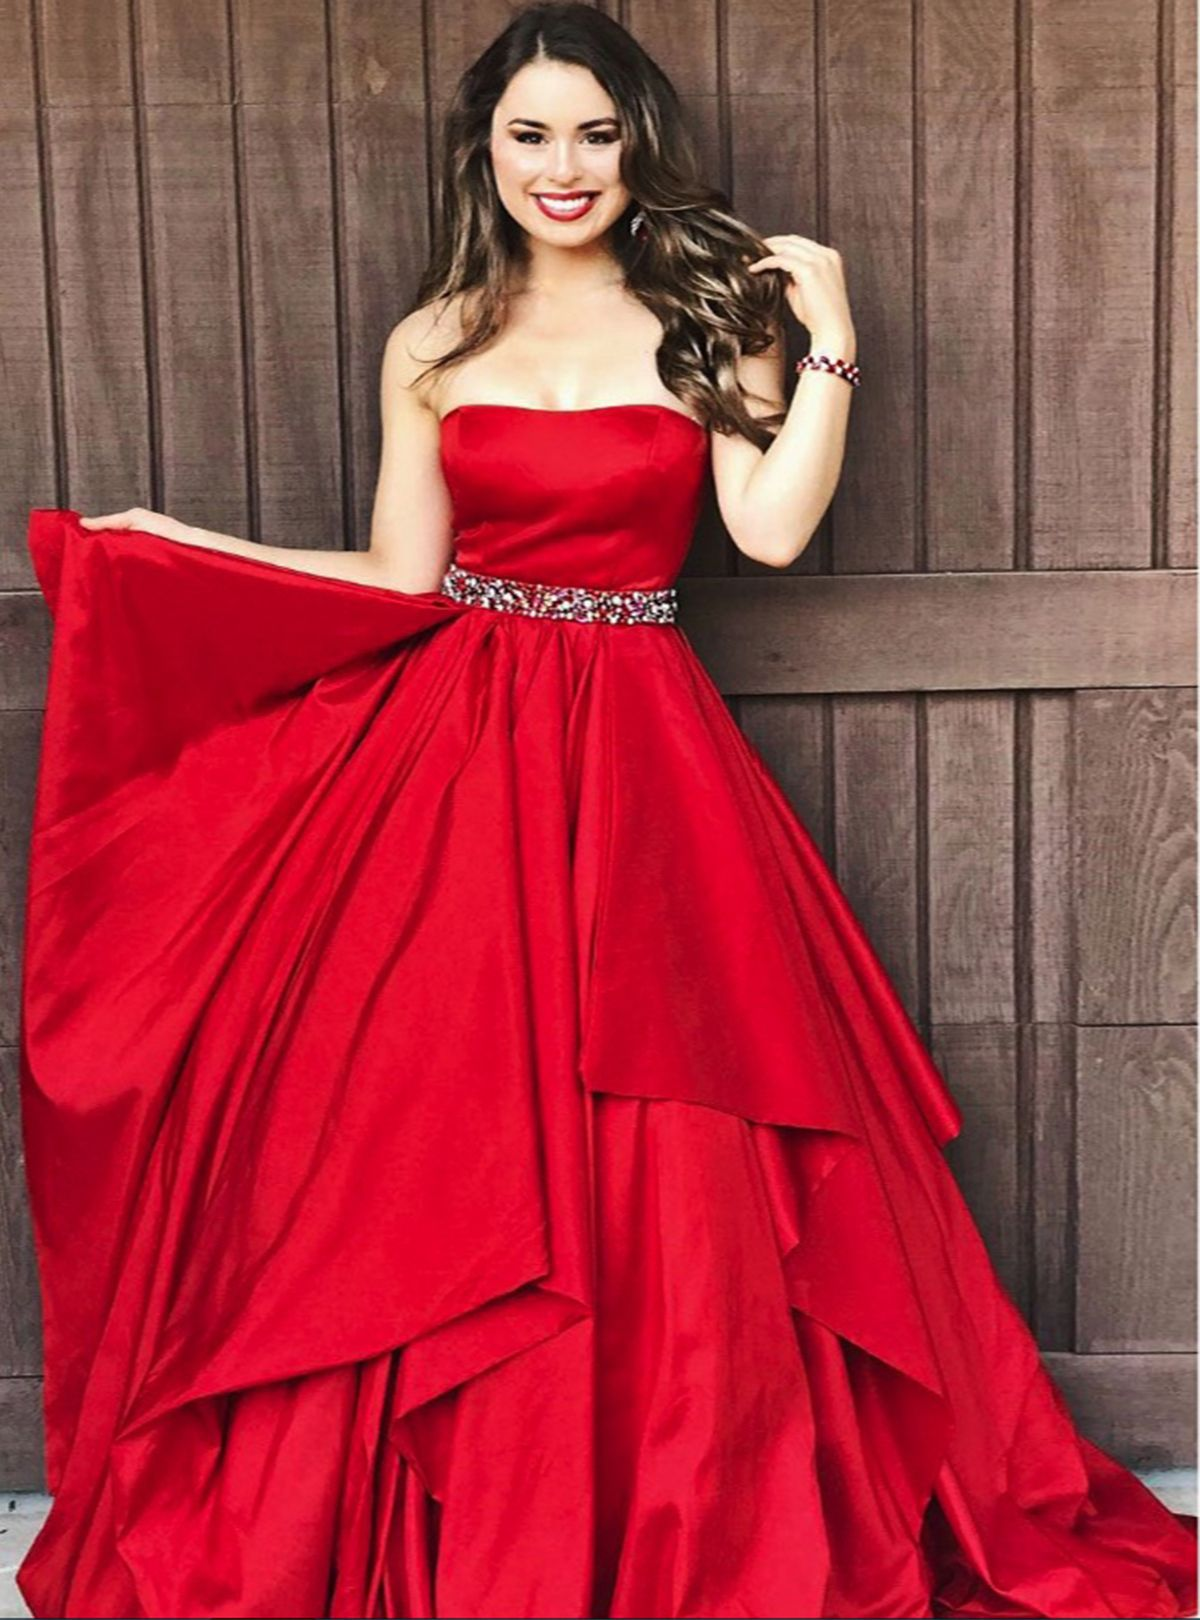 Sweet dresses cute red satin long prom dress for teens dress